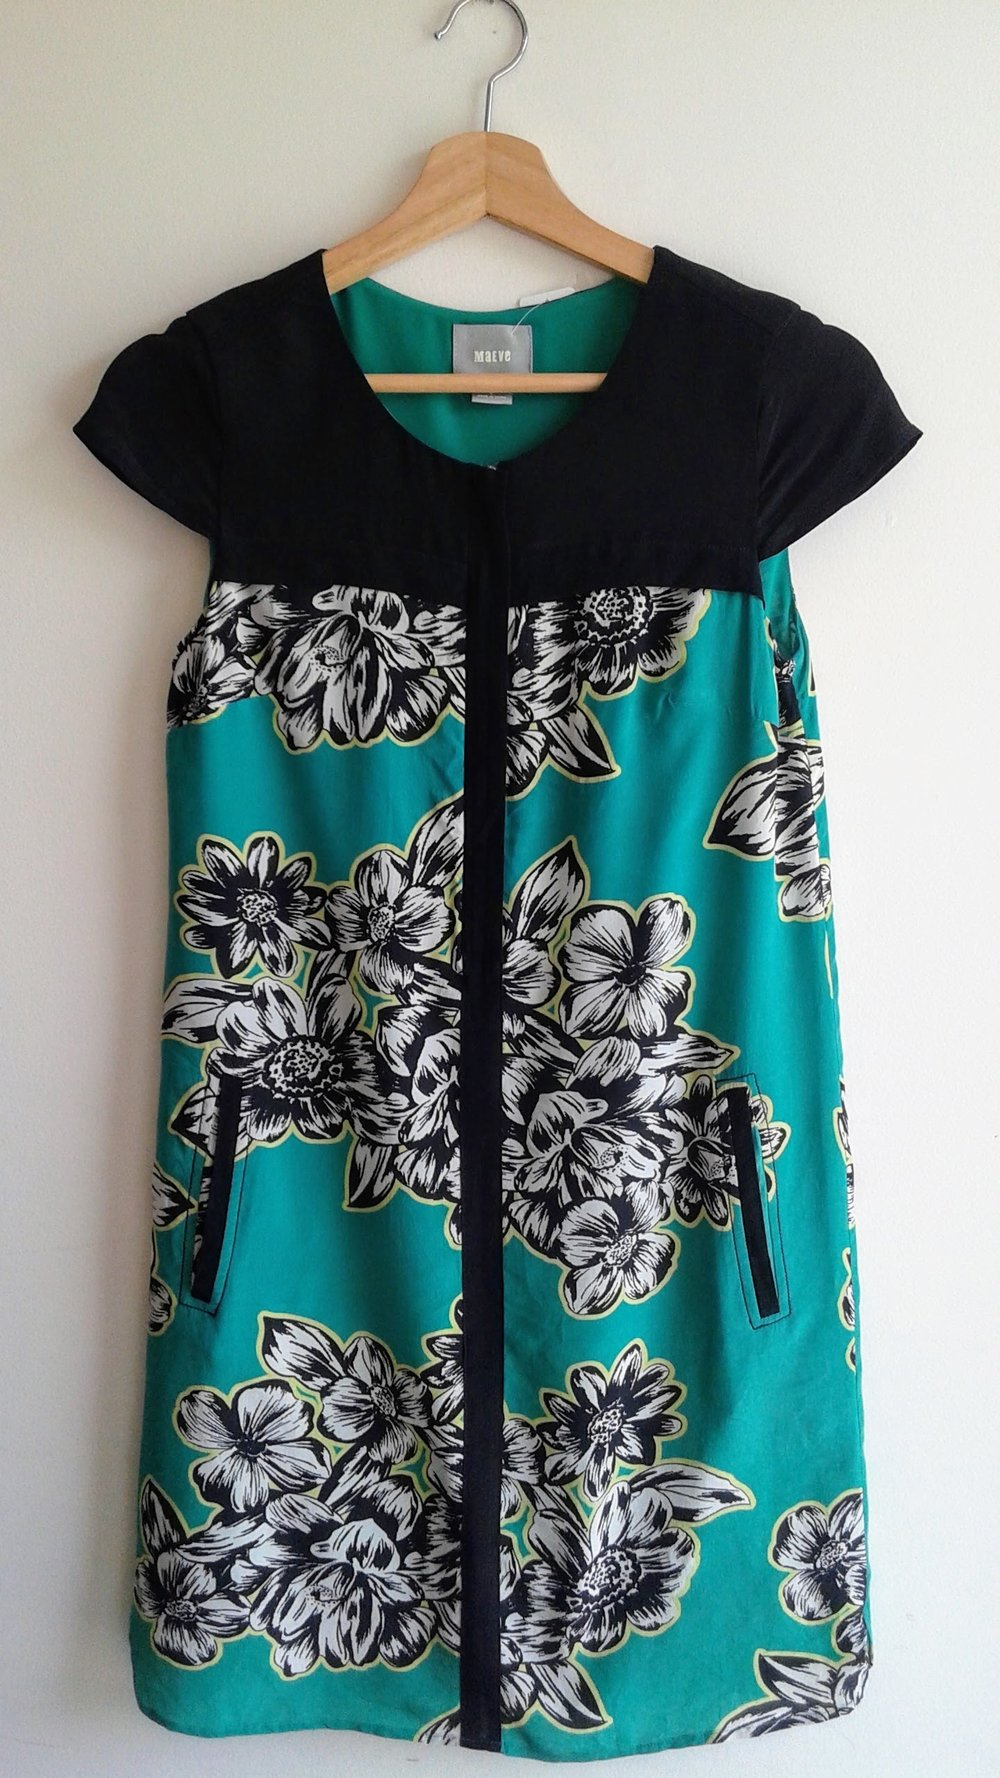 Maeve dress; Size 0, $42